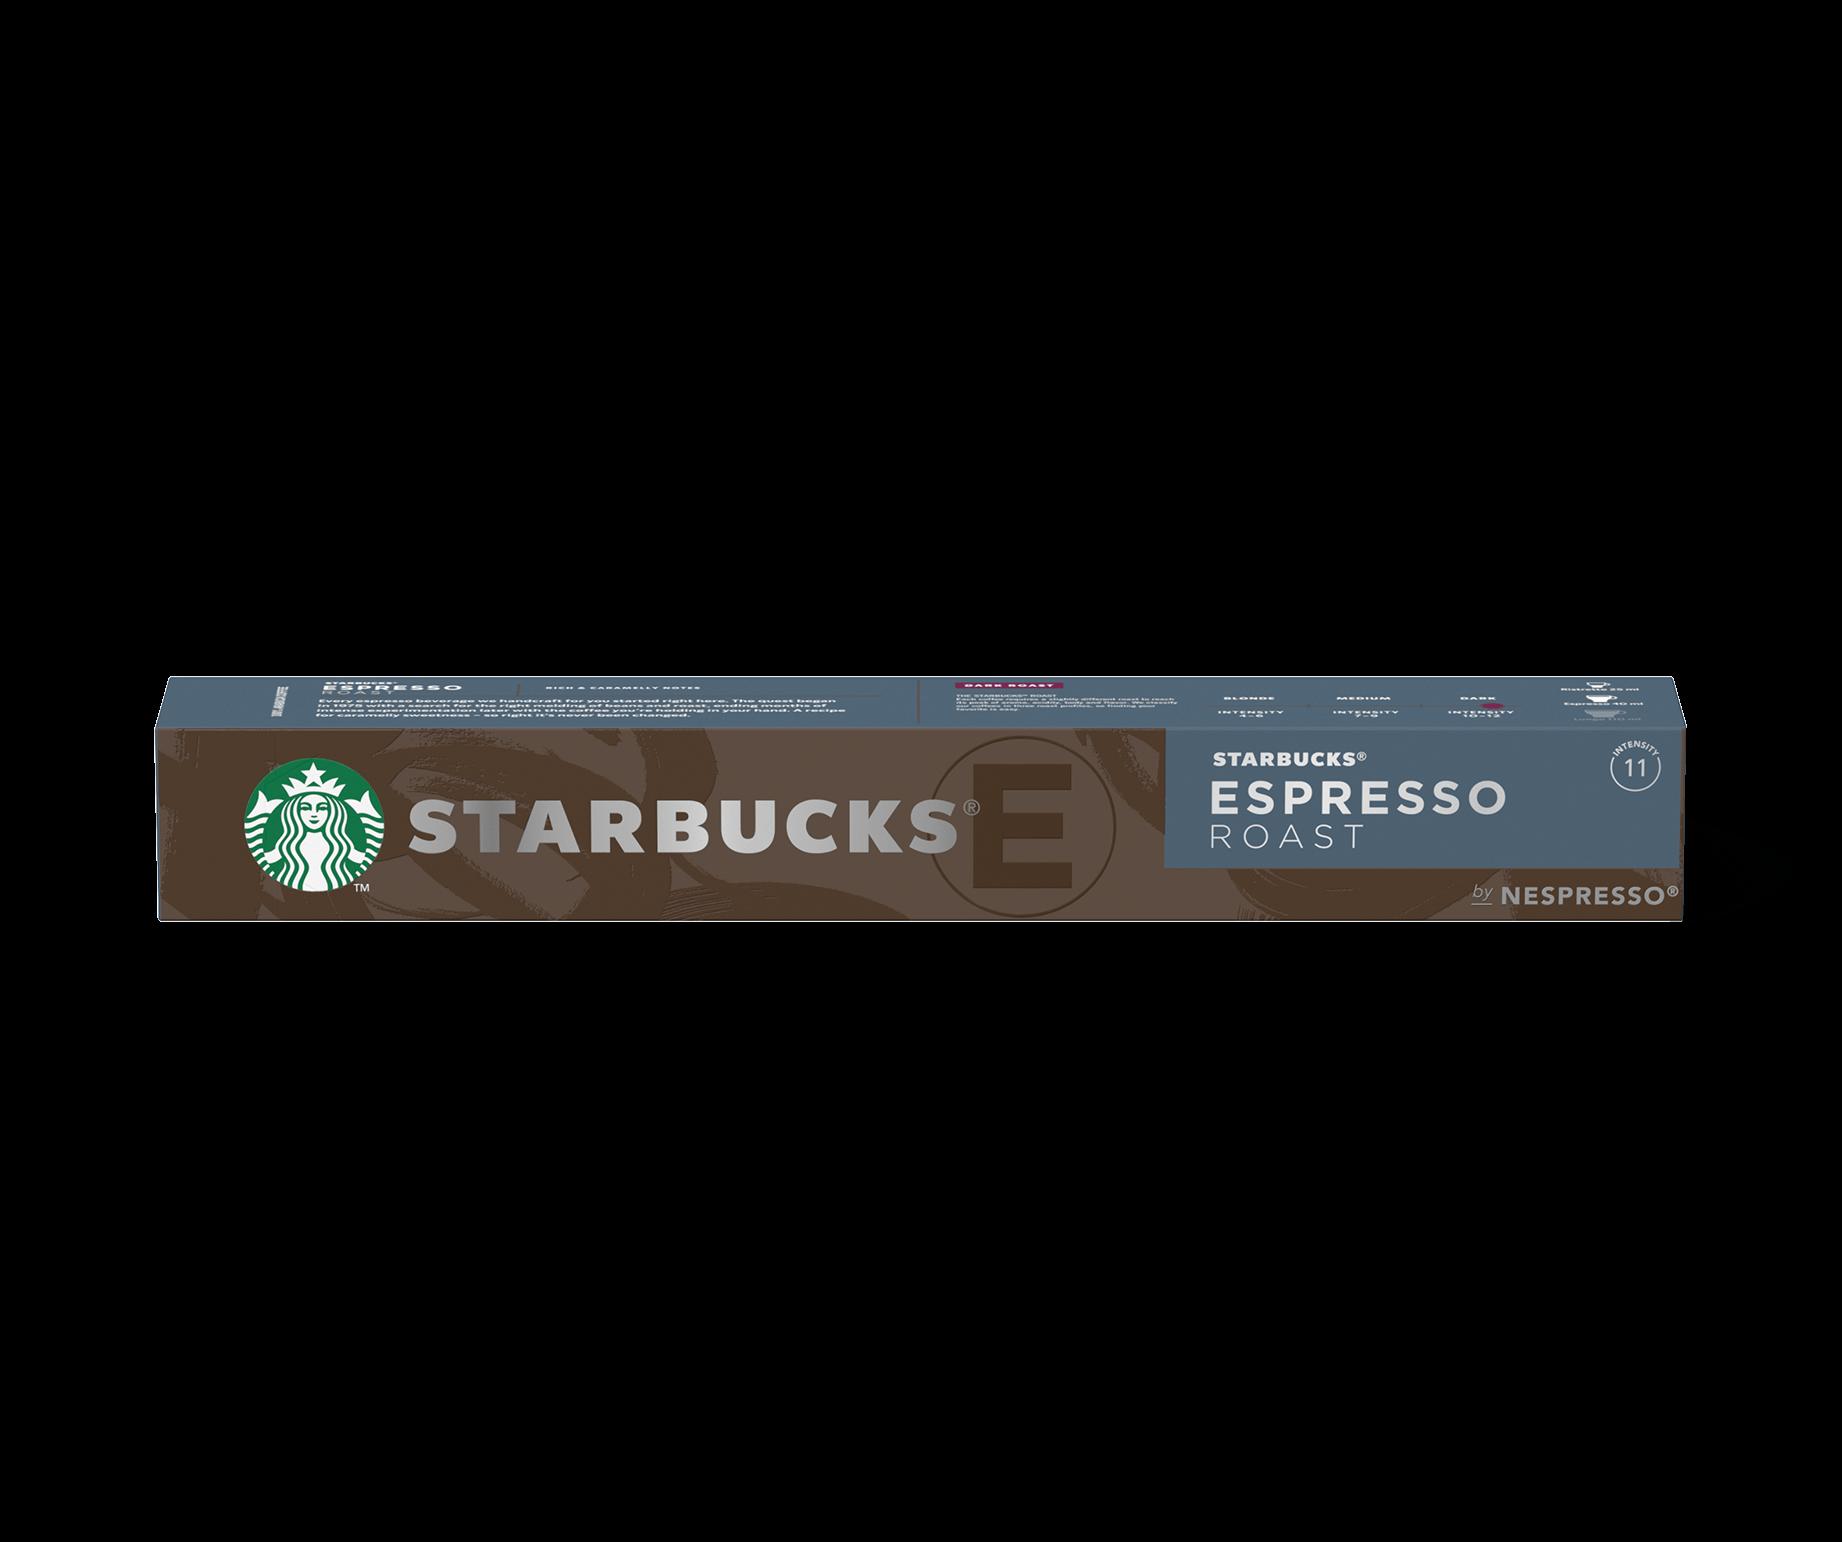 STARBUCKS® Espresso Roast